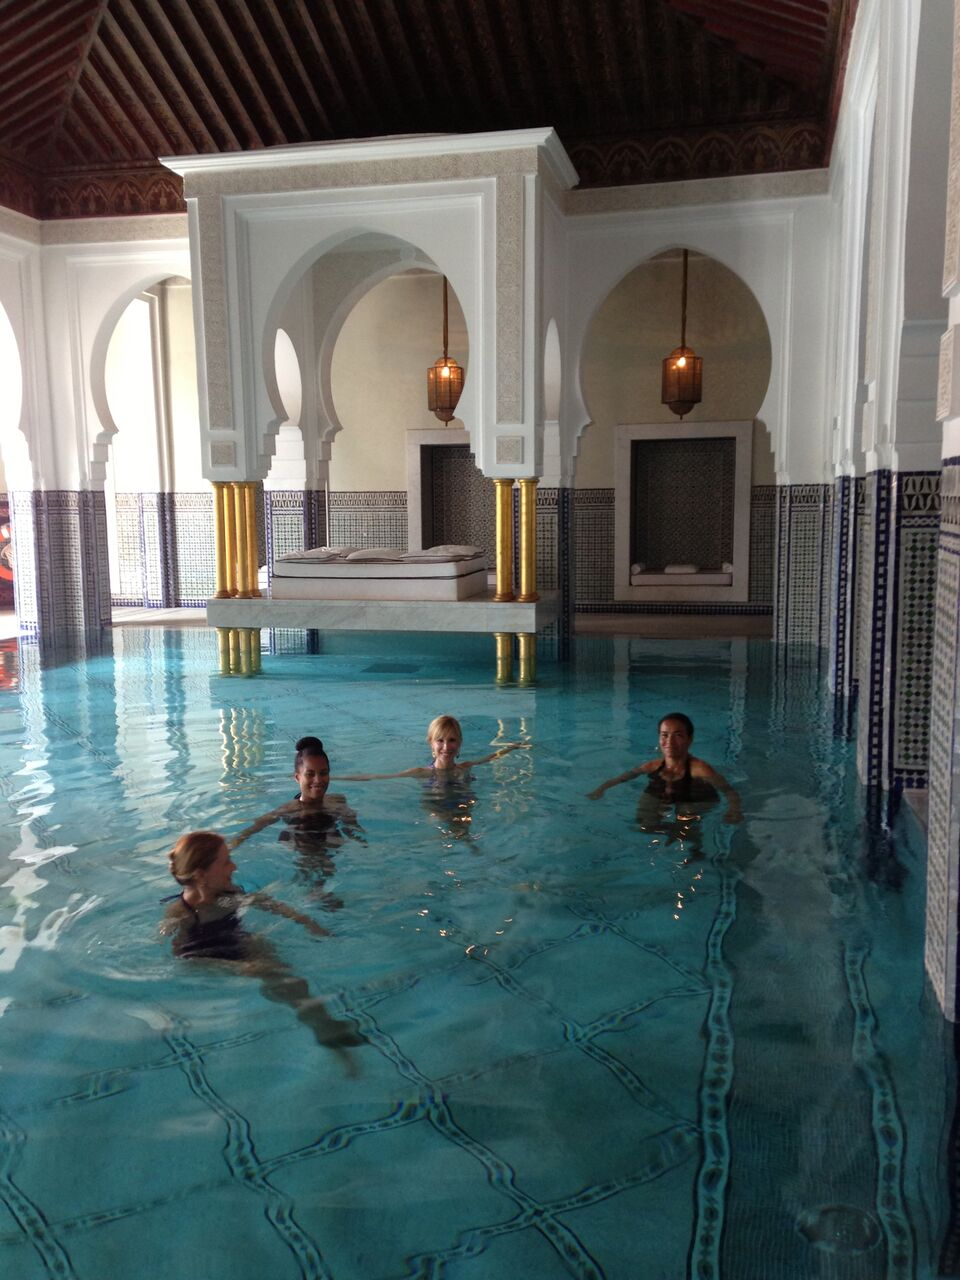 La Mamounia pool | EAT.PRAY.MOVE Yoga Retreats | Marrakesh, Morocco